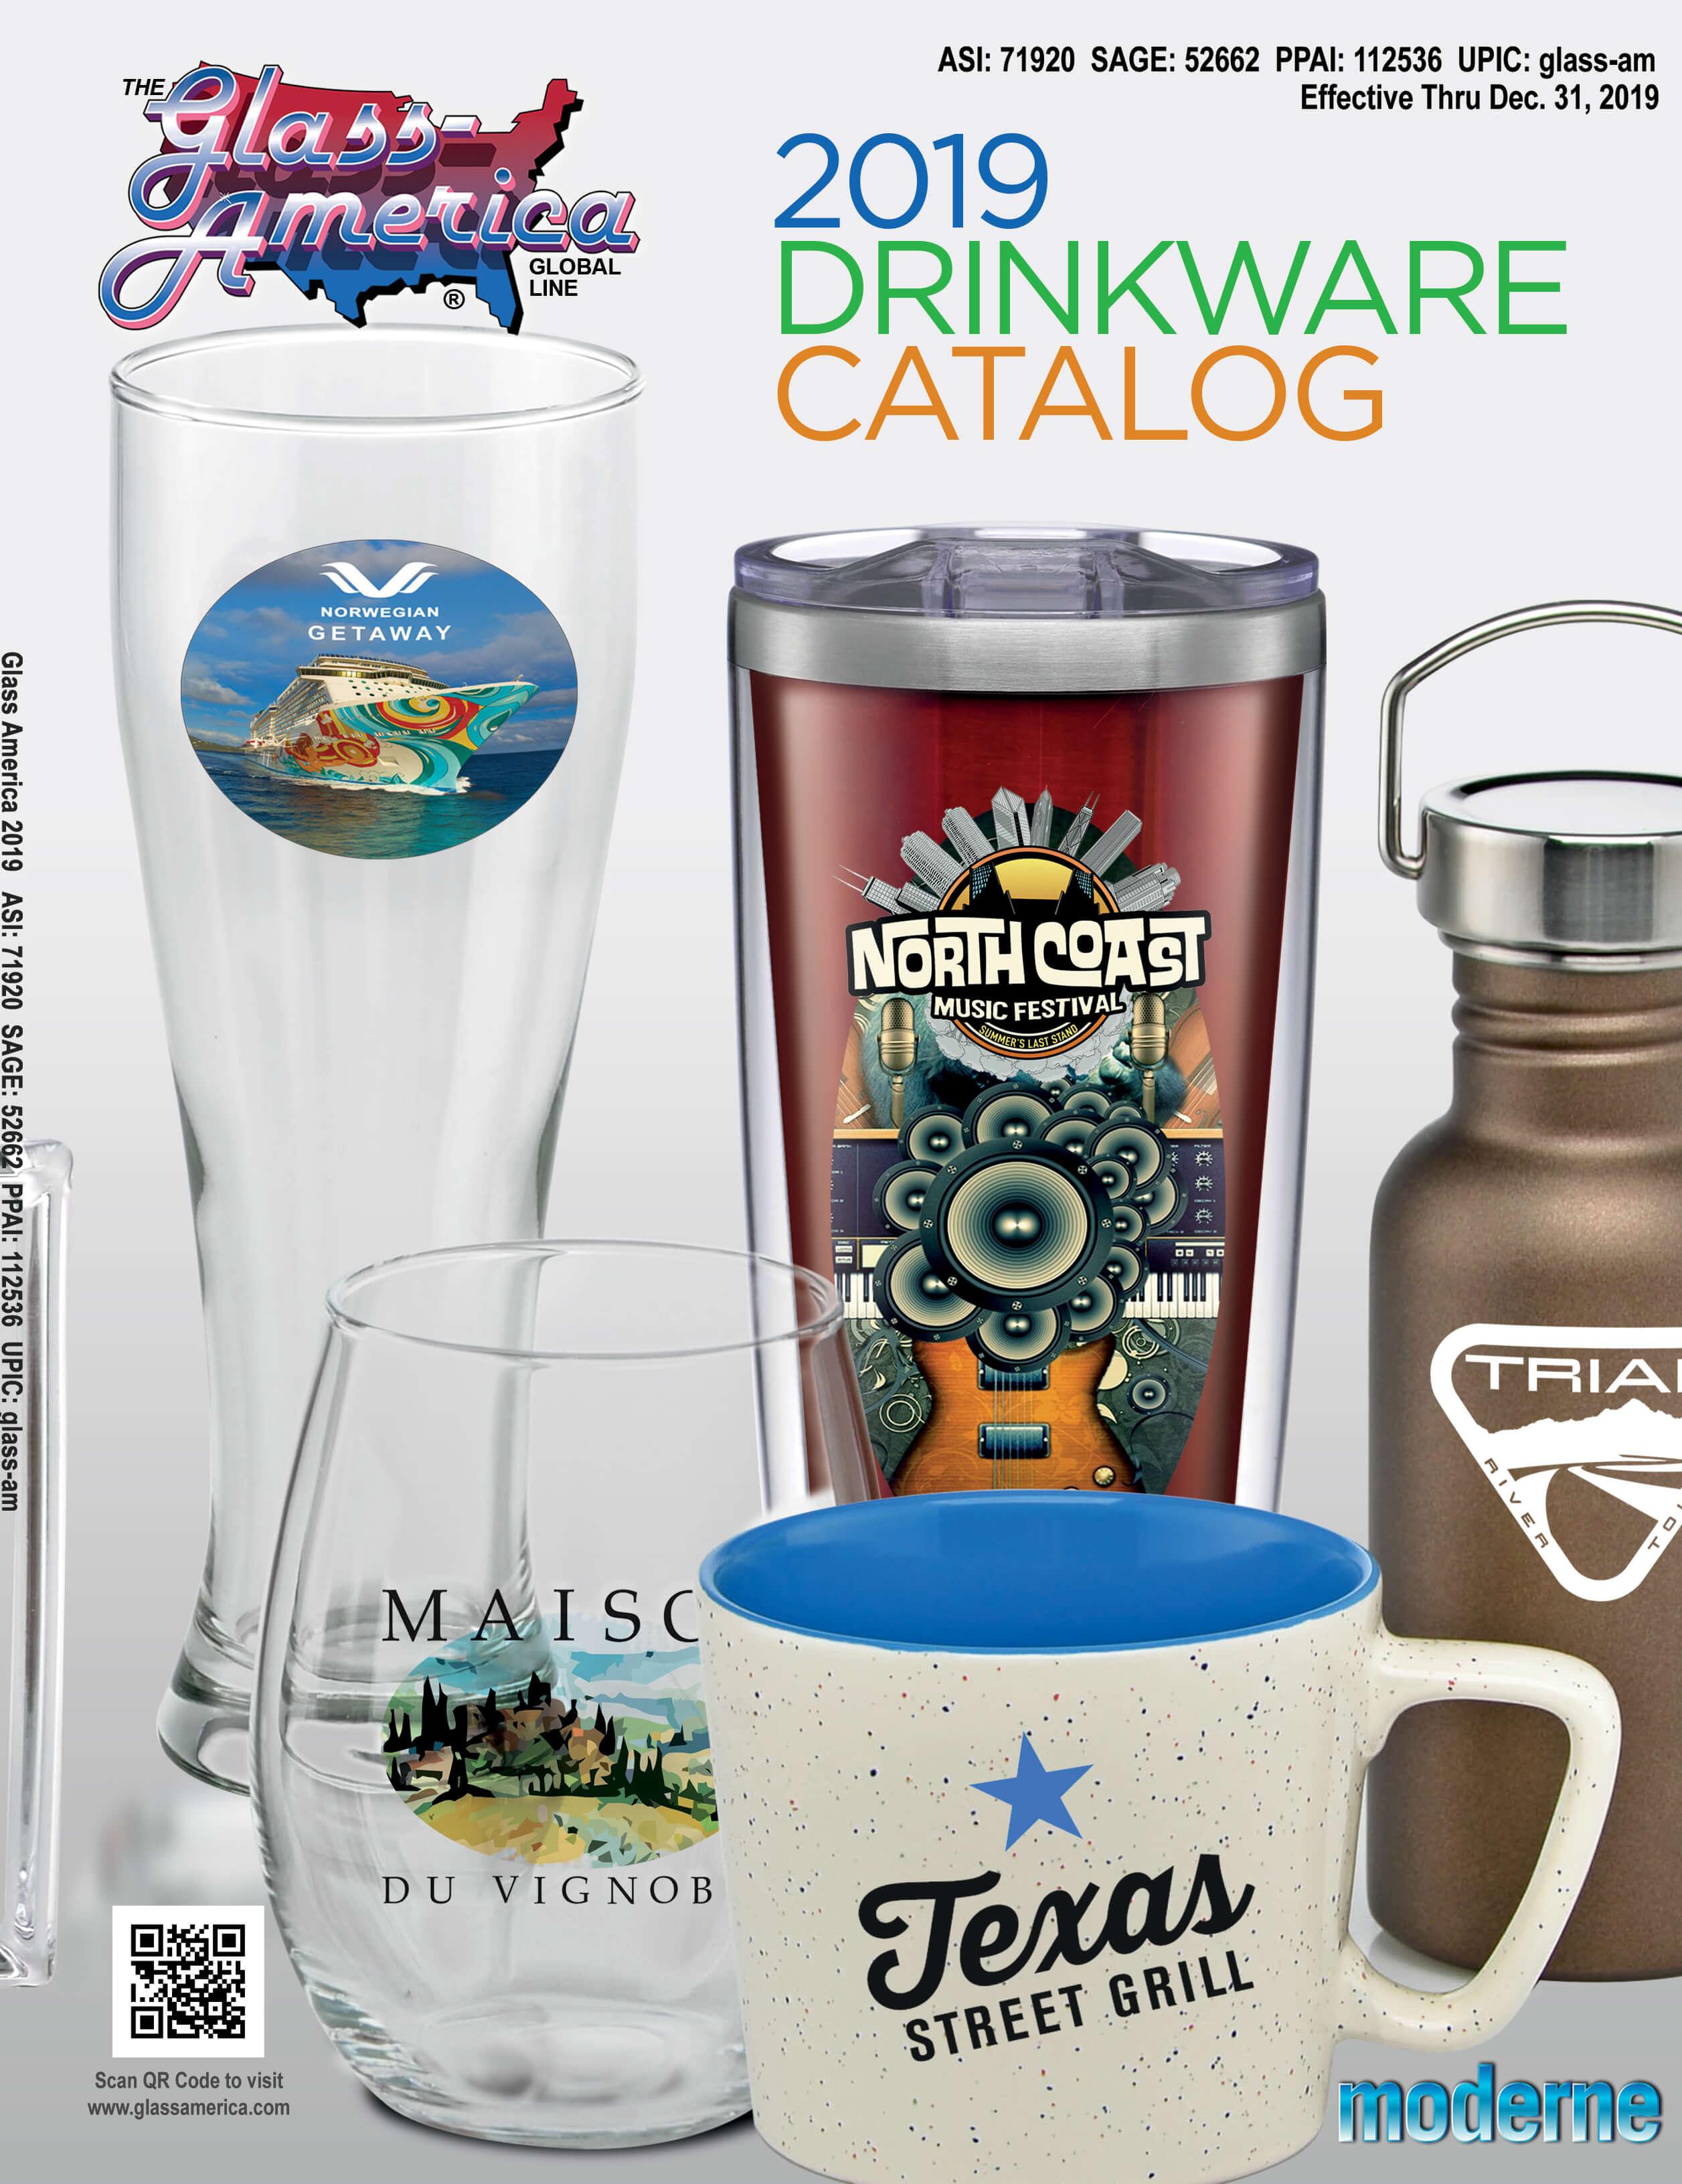 2019 Drinkware Catalog